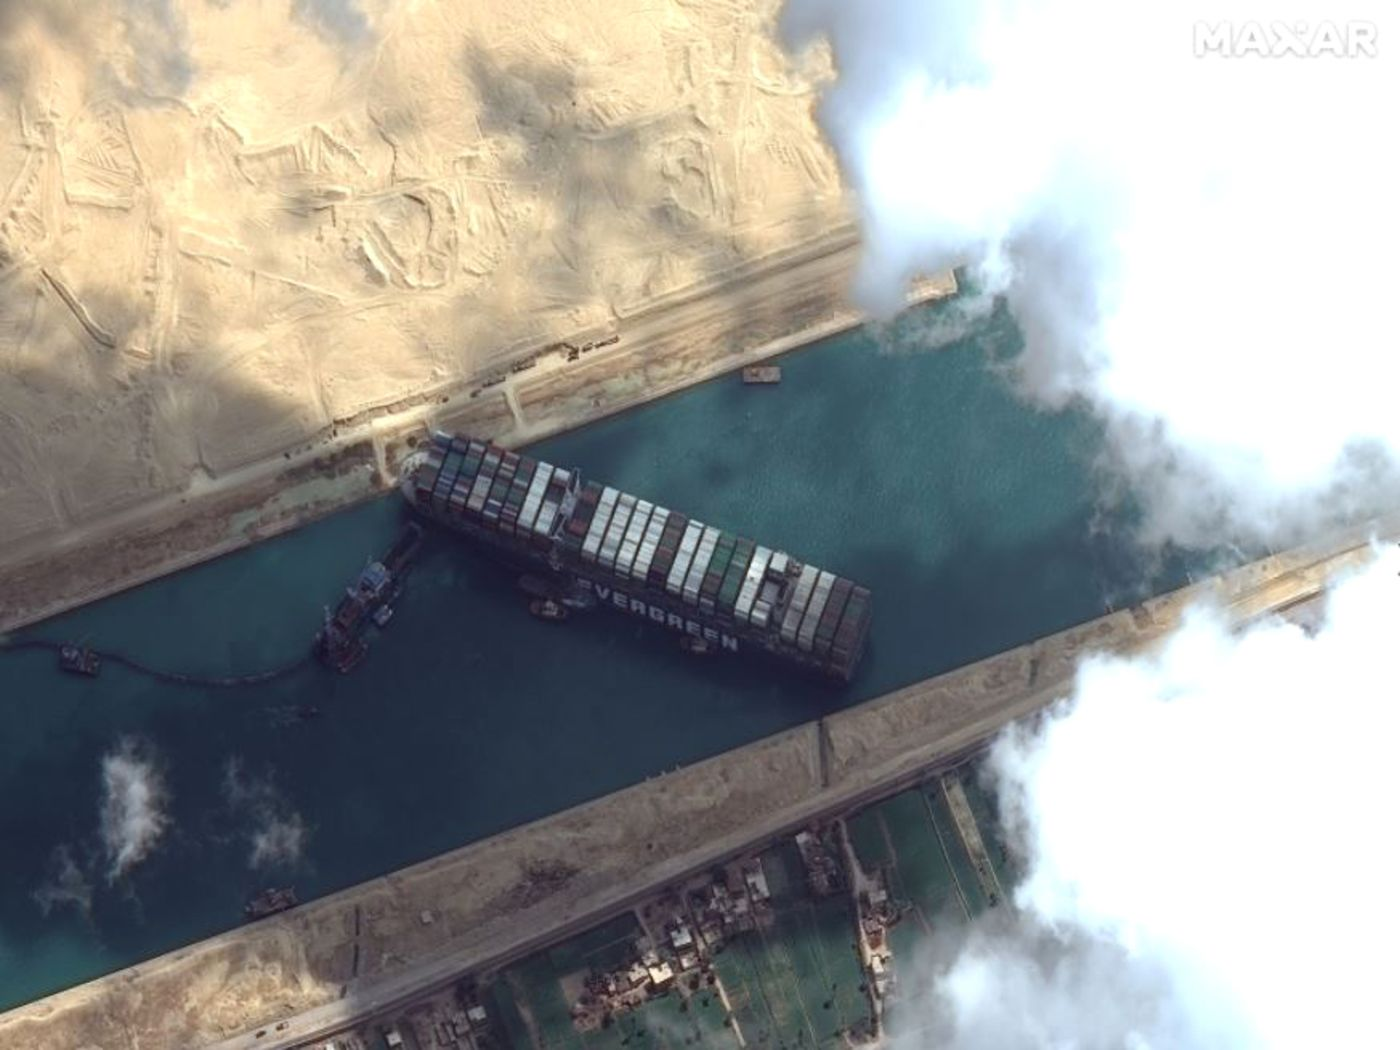 suez canal ship MAXAR